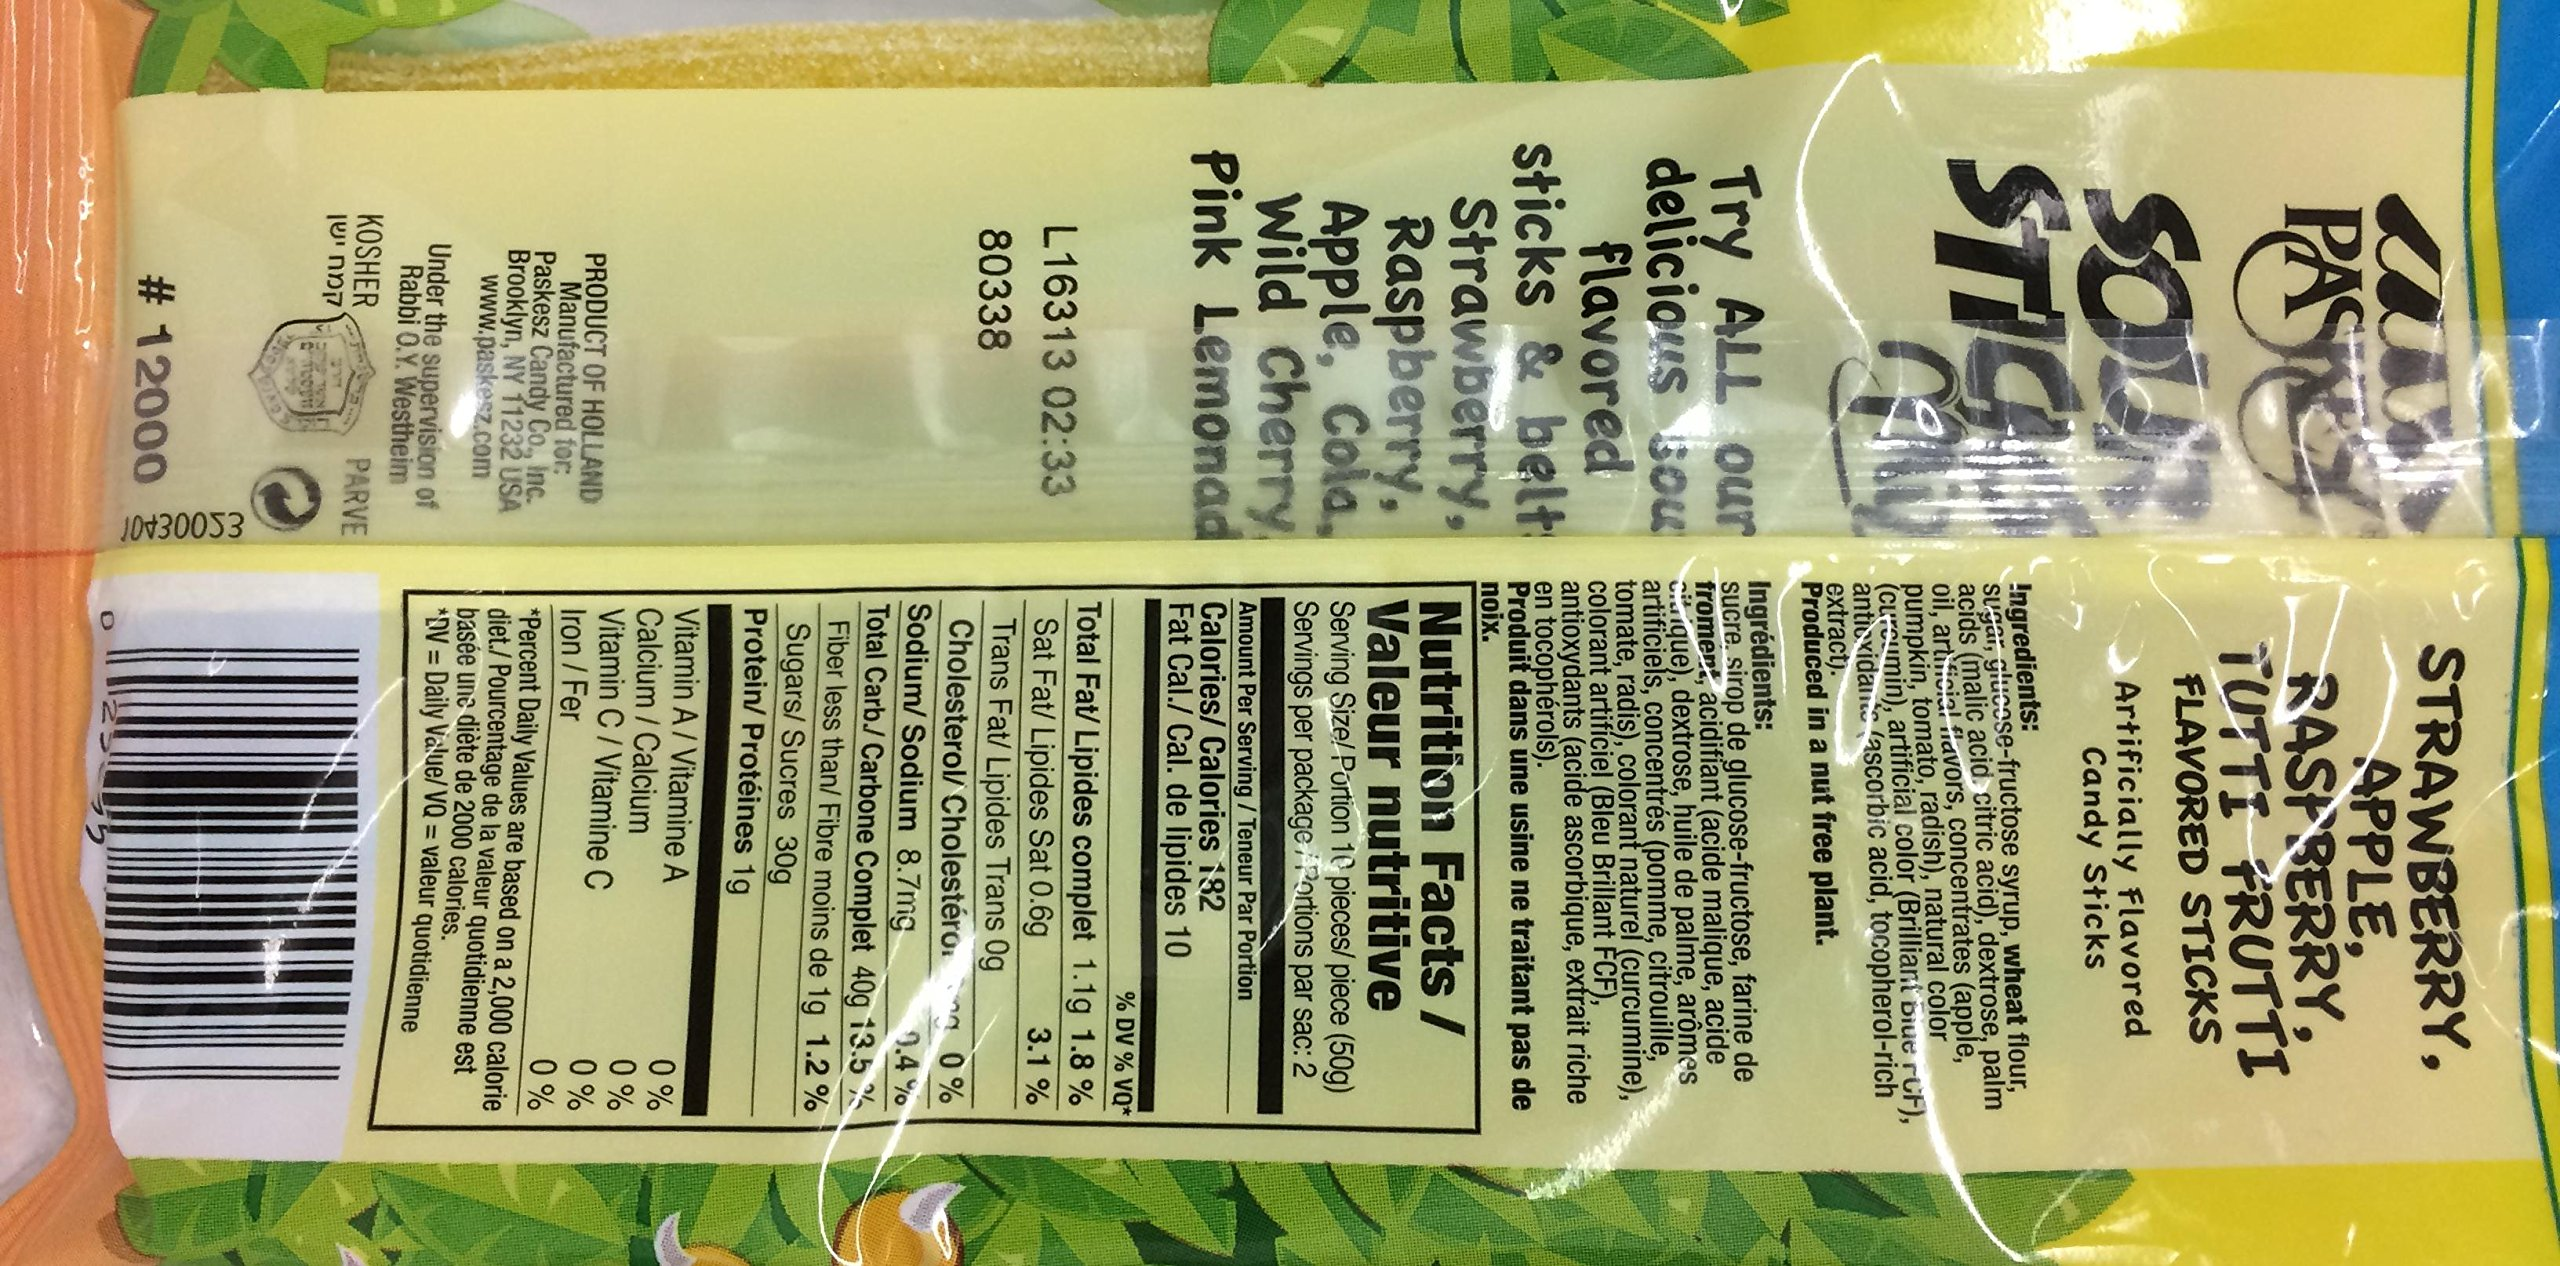 Paskesz Sour Sticks Mix Multi Flavored 3.5 Oz. Pack Of 3.